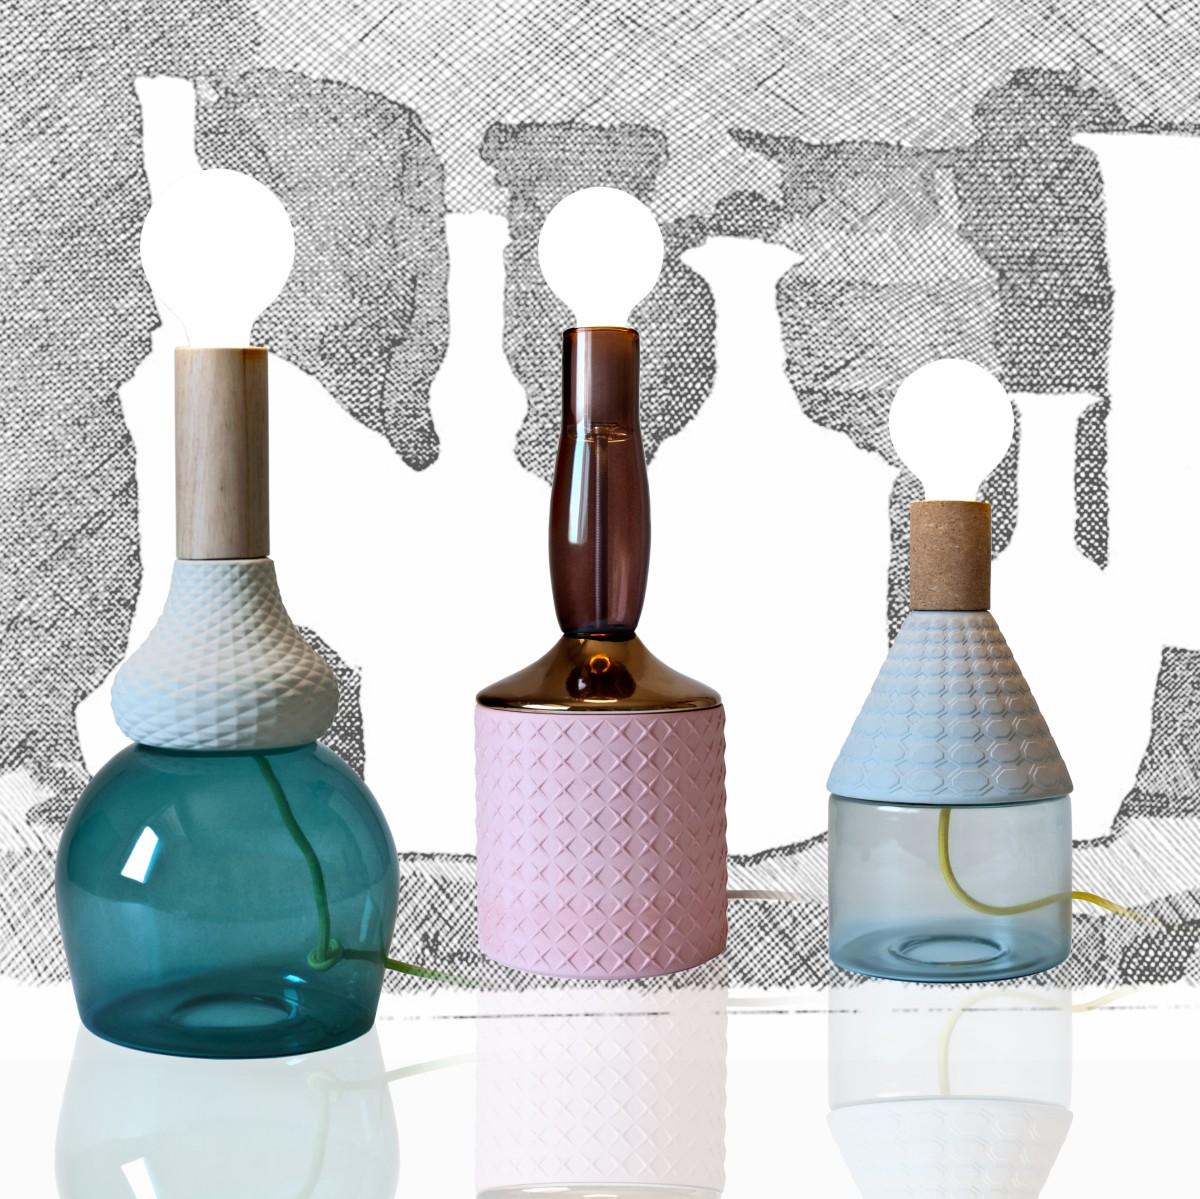 Idées de cadeaux de Noël 2015, MRND Anna, Dina, Maria Teresa, Design Elena Salmistraro